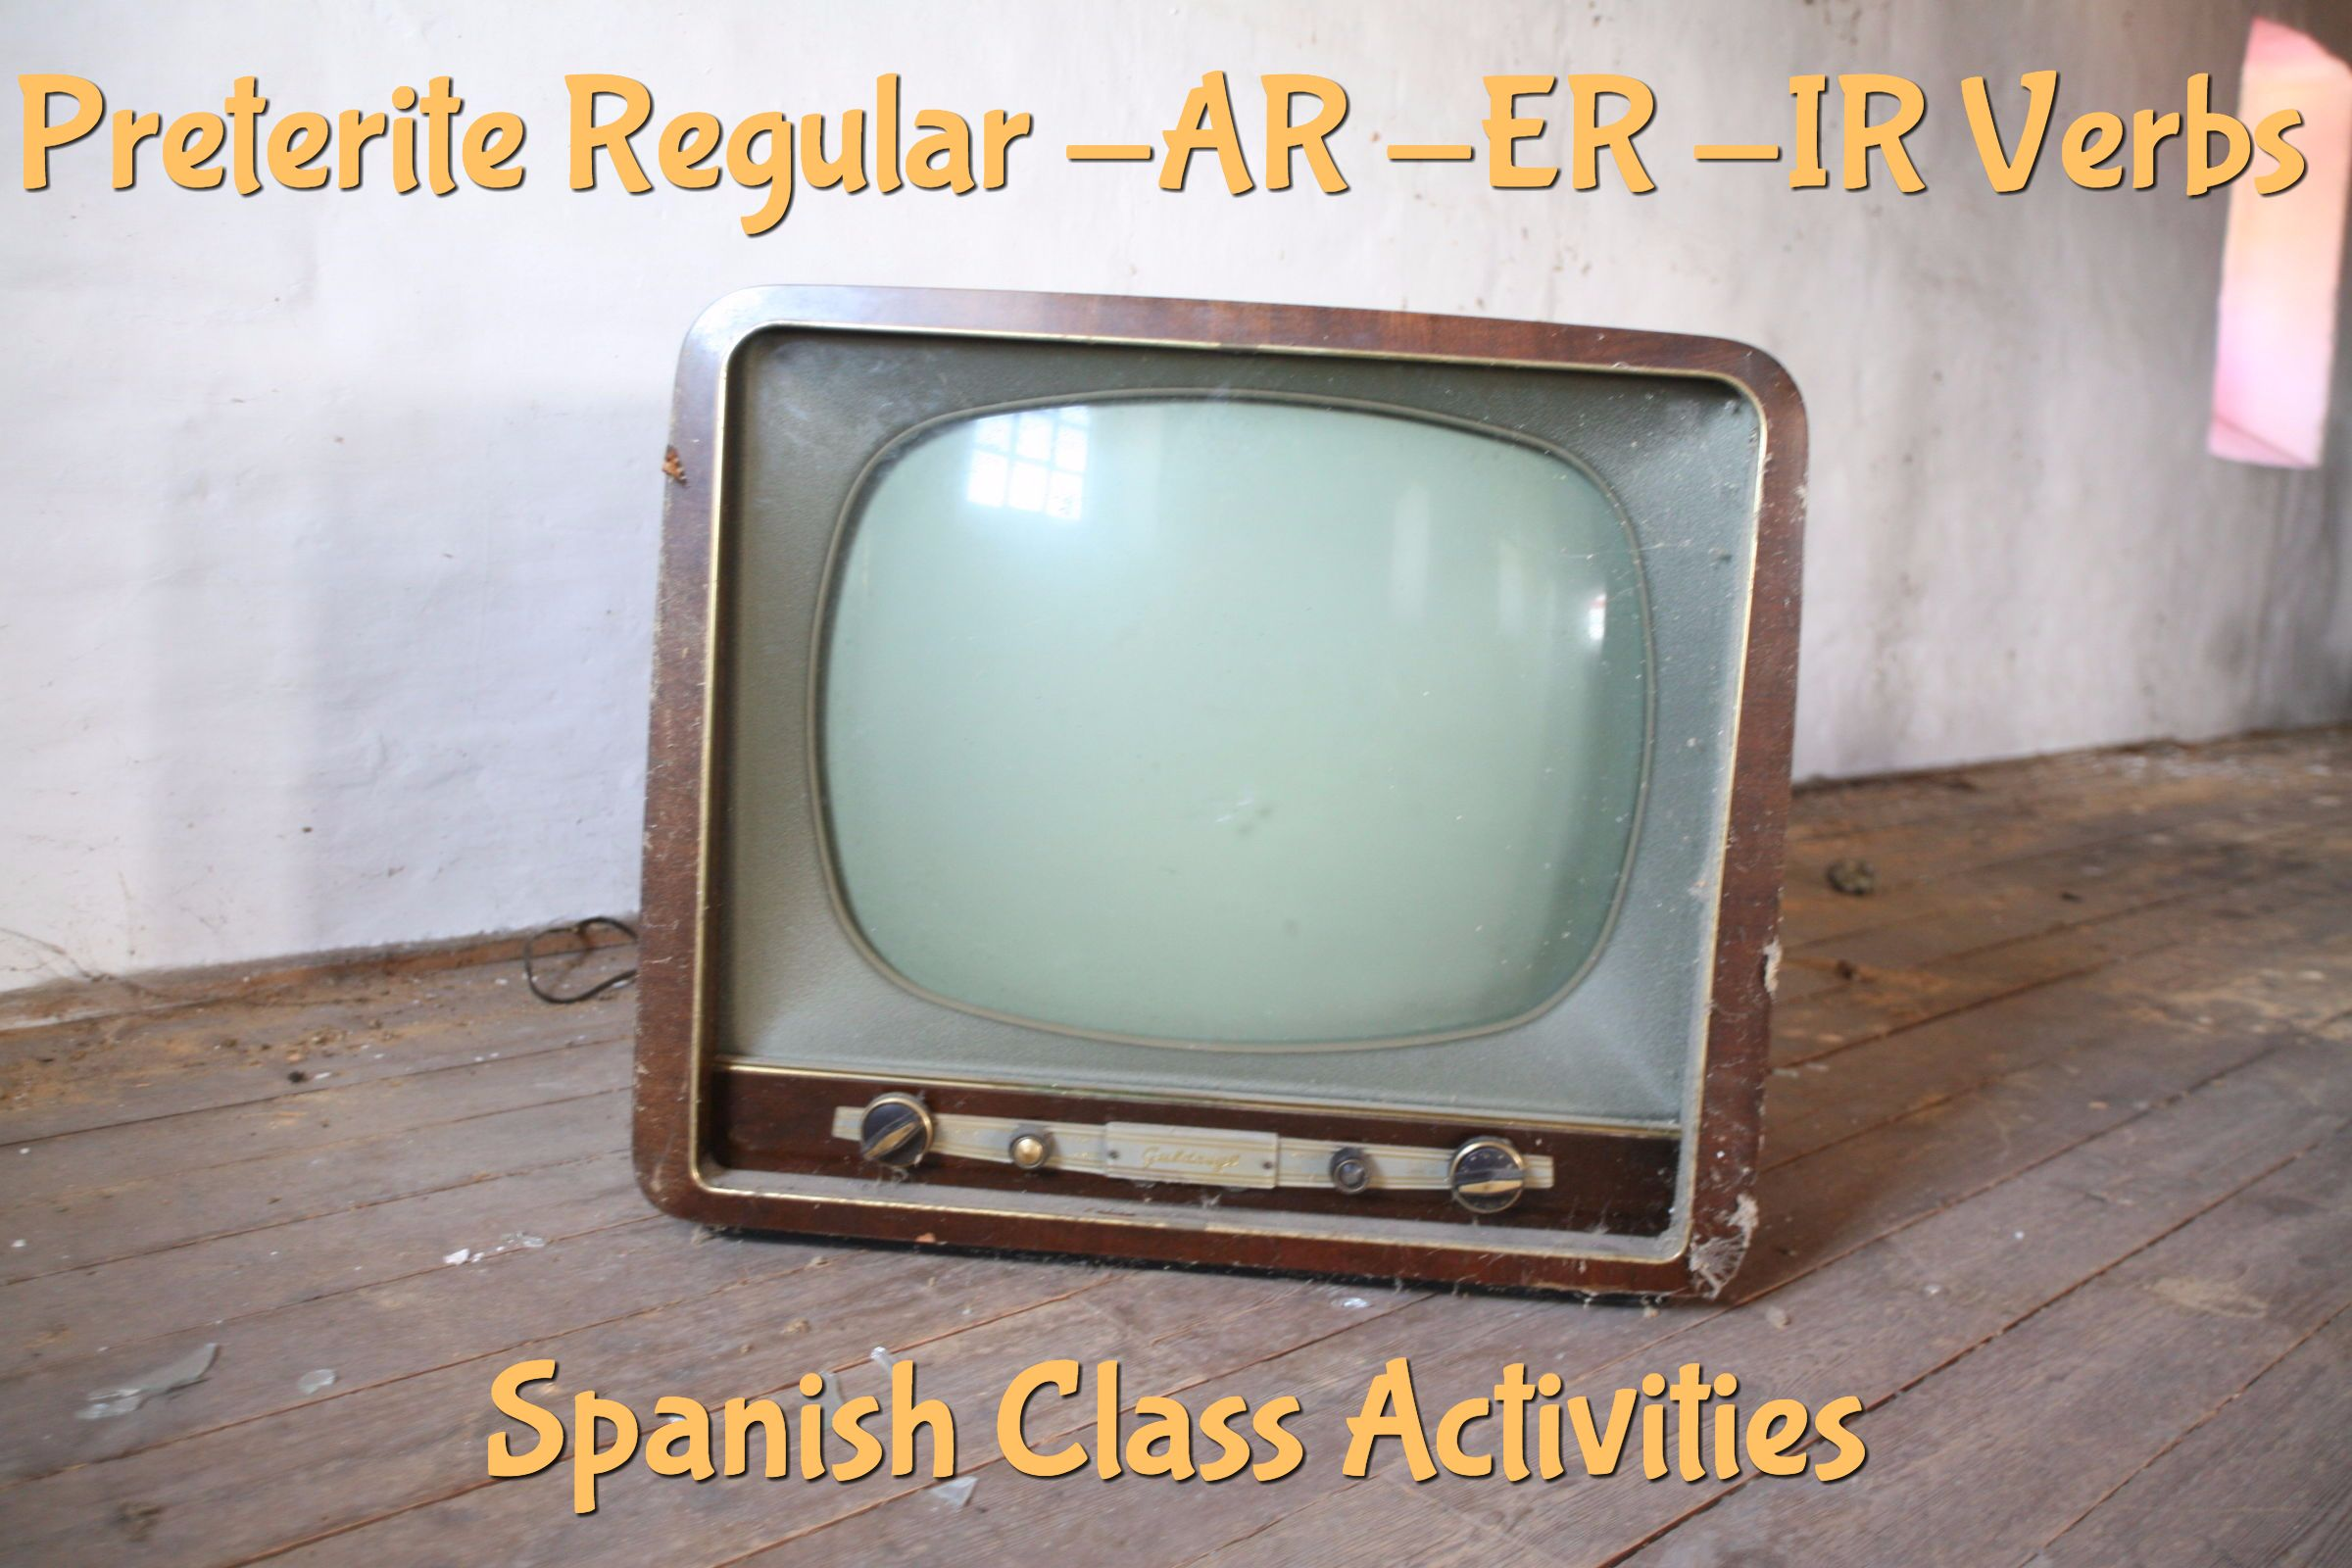 Preterite Regular Ar Er Ir Verbs Spanish Class Activities Spanish Learning Activities Spanish Class Preterite [ 1600 x 2400 Pixel ]